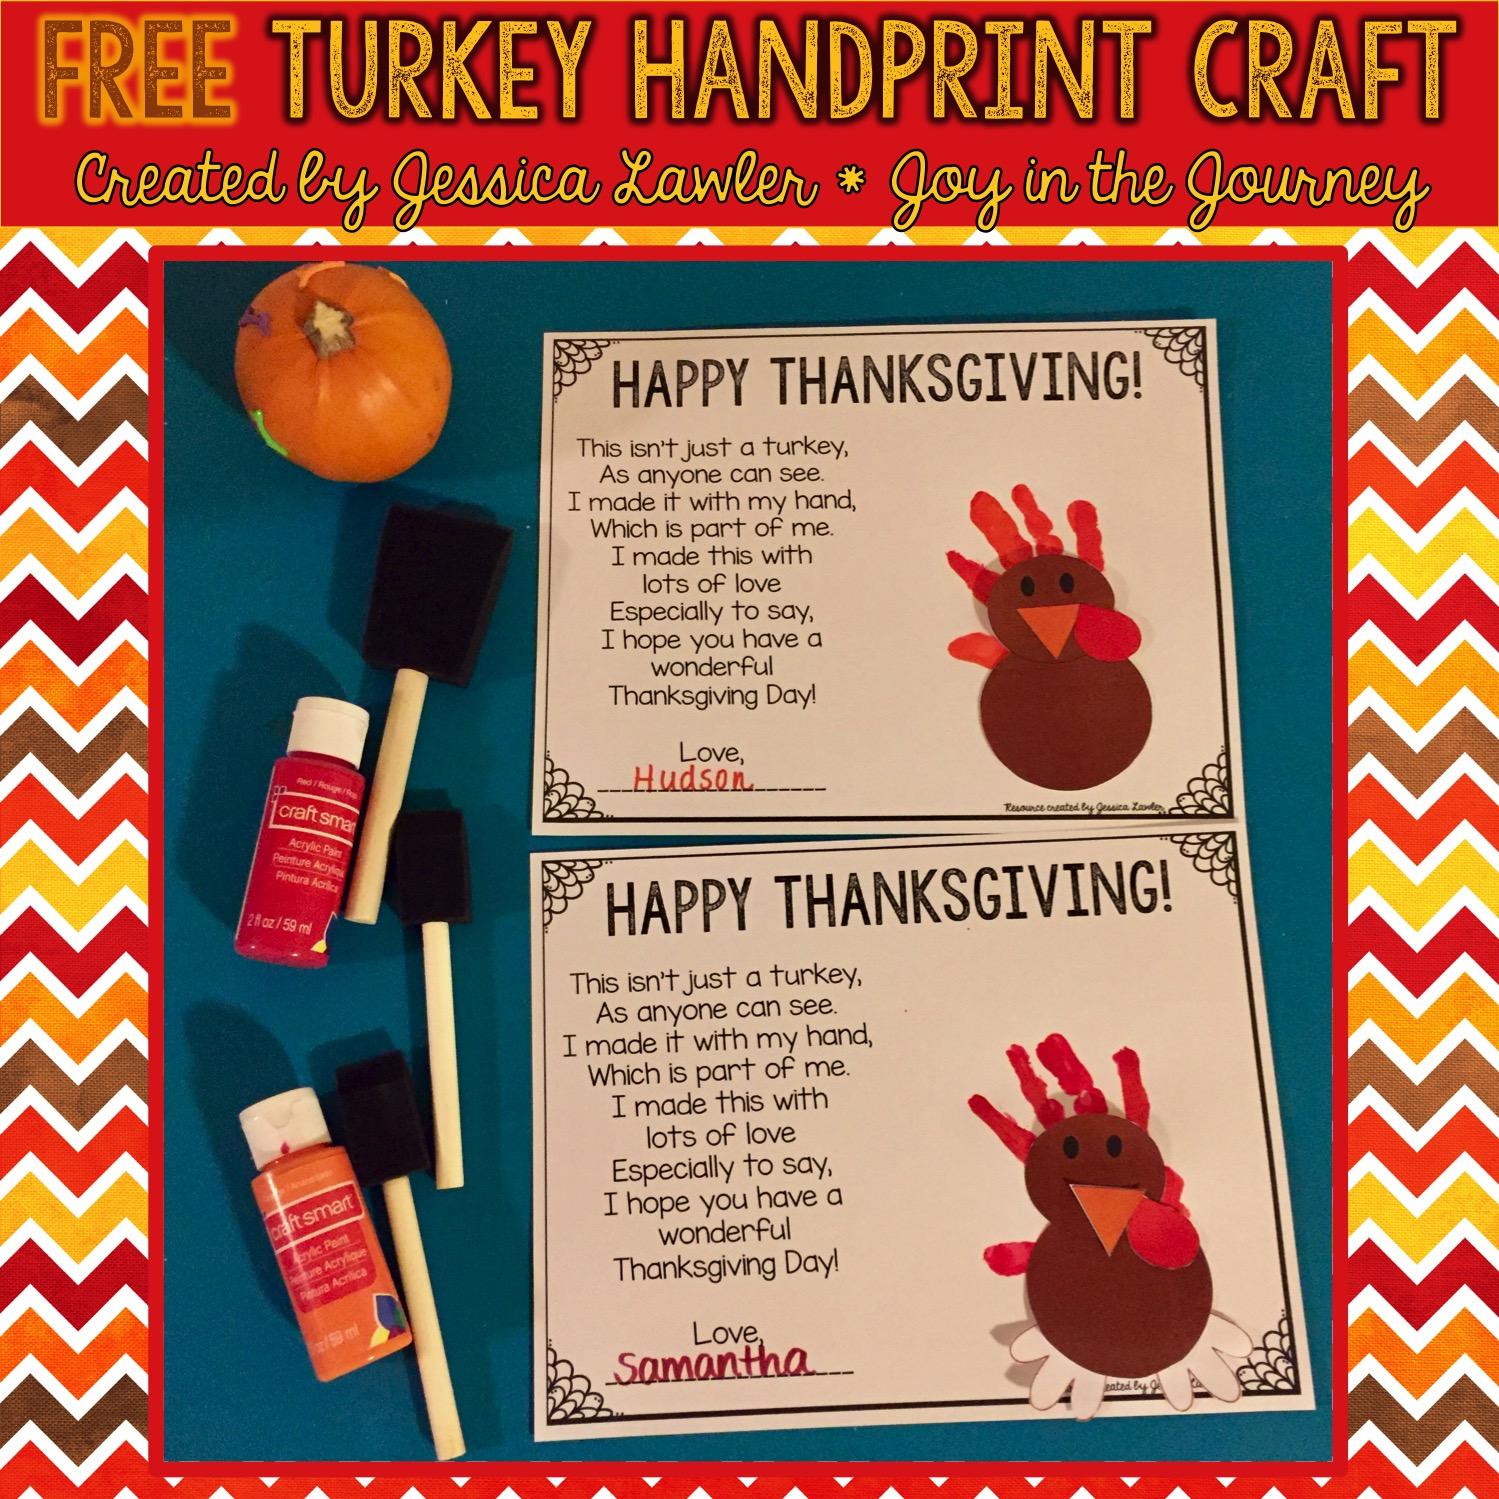 Free Turkey Handprint Craft